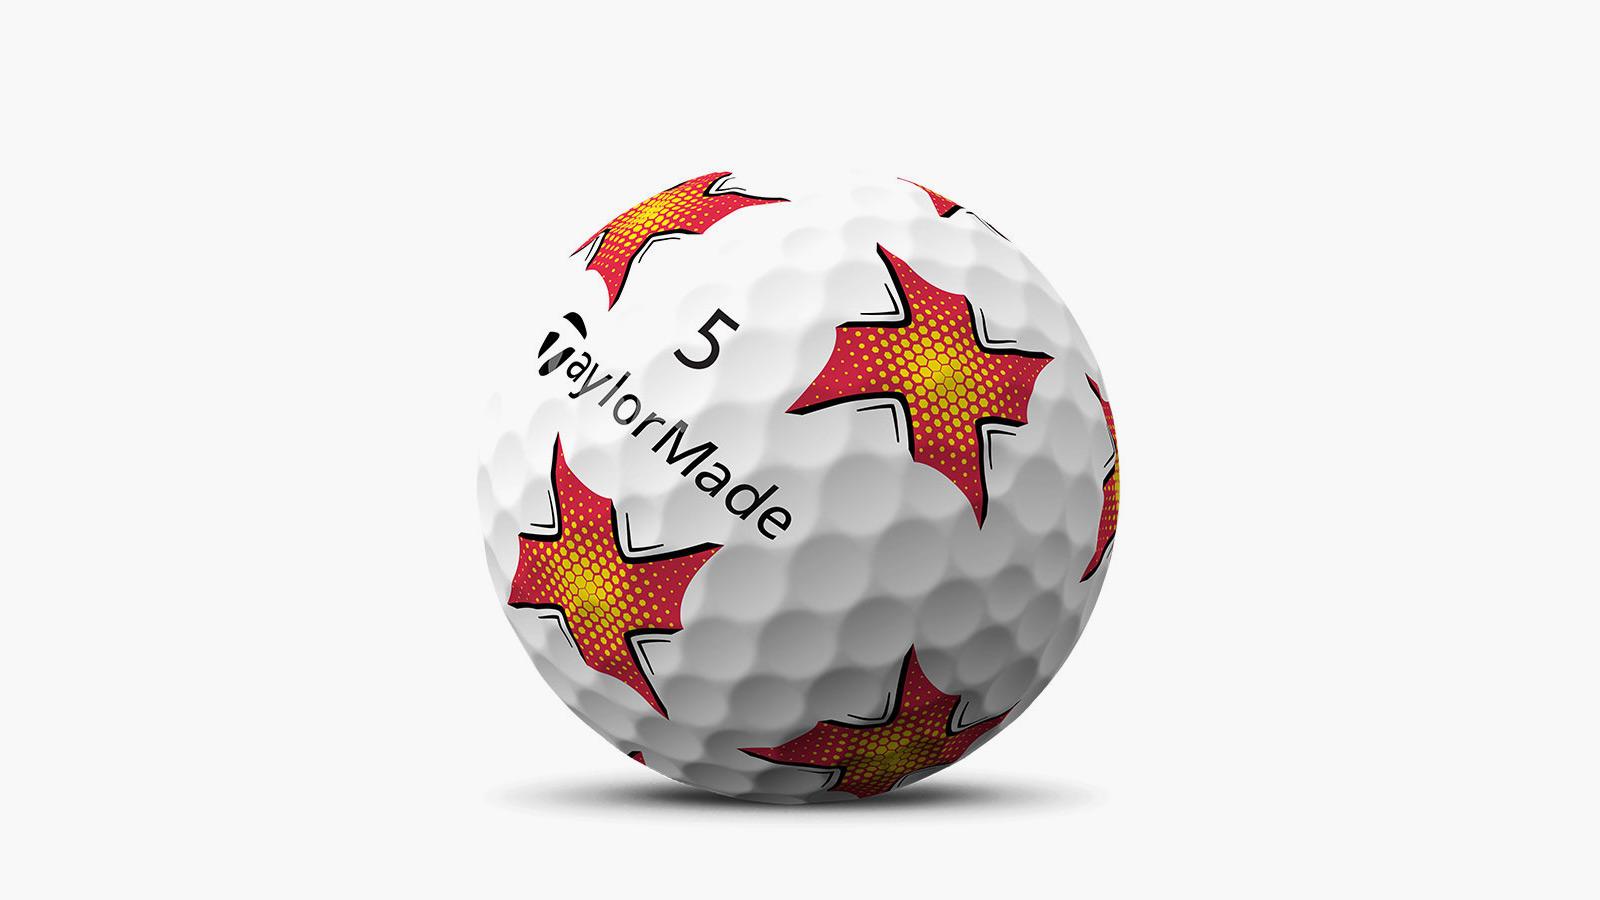 aylorMade TP5 Pix Golf Balls